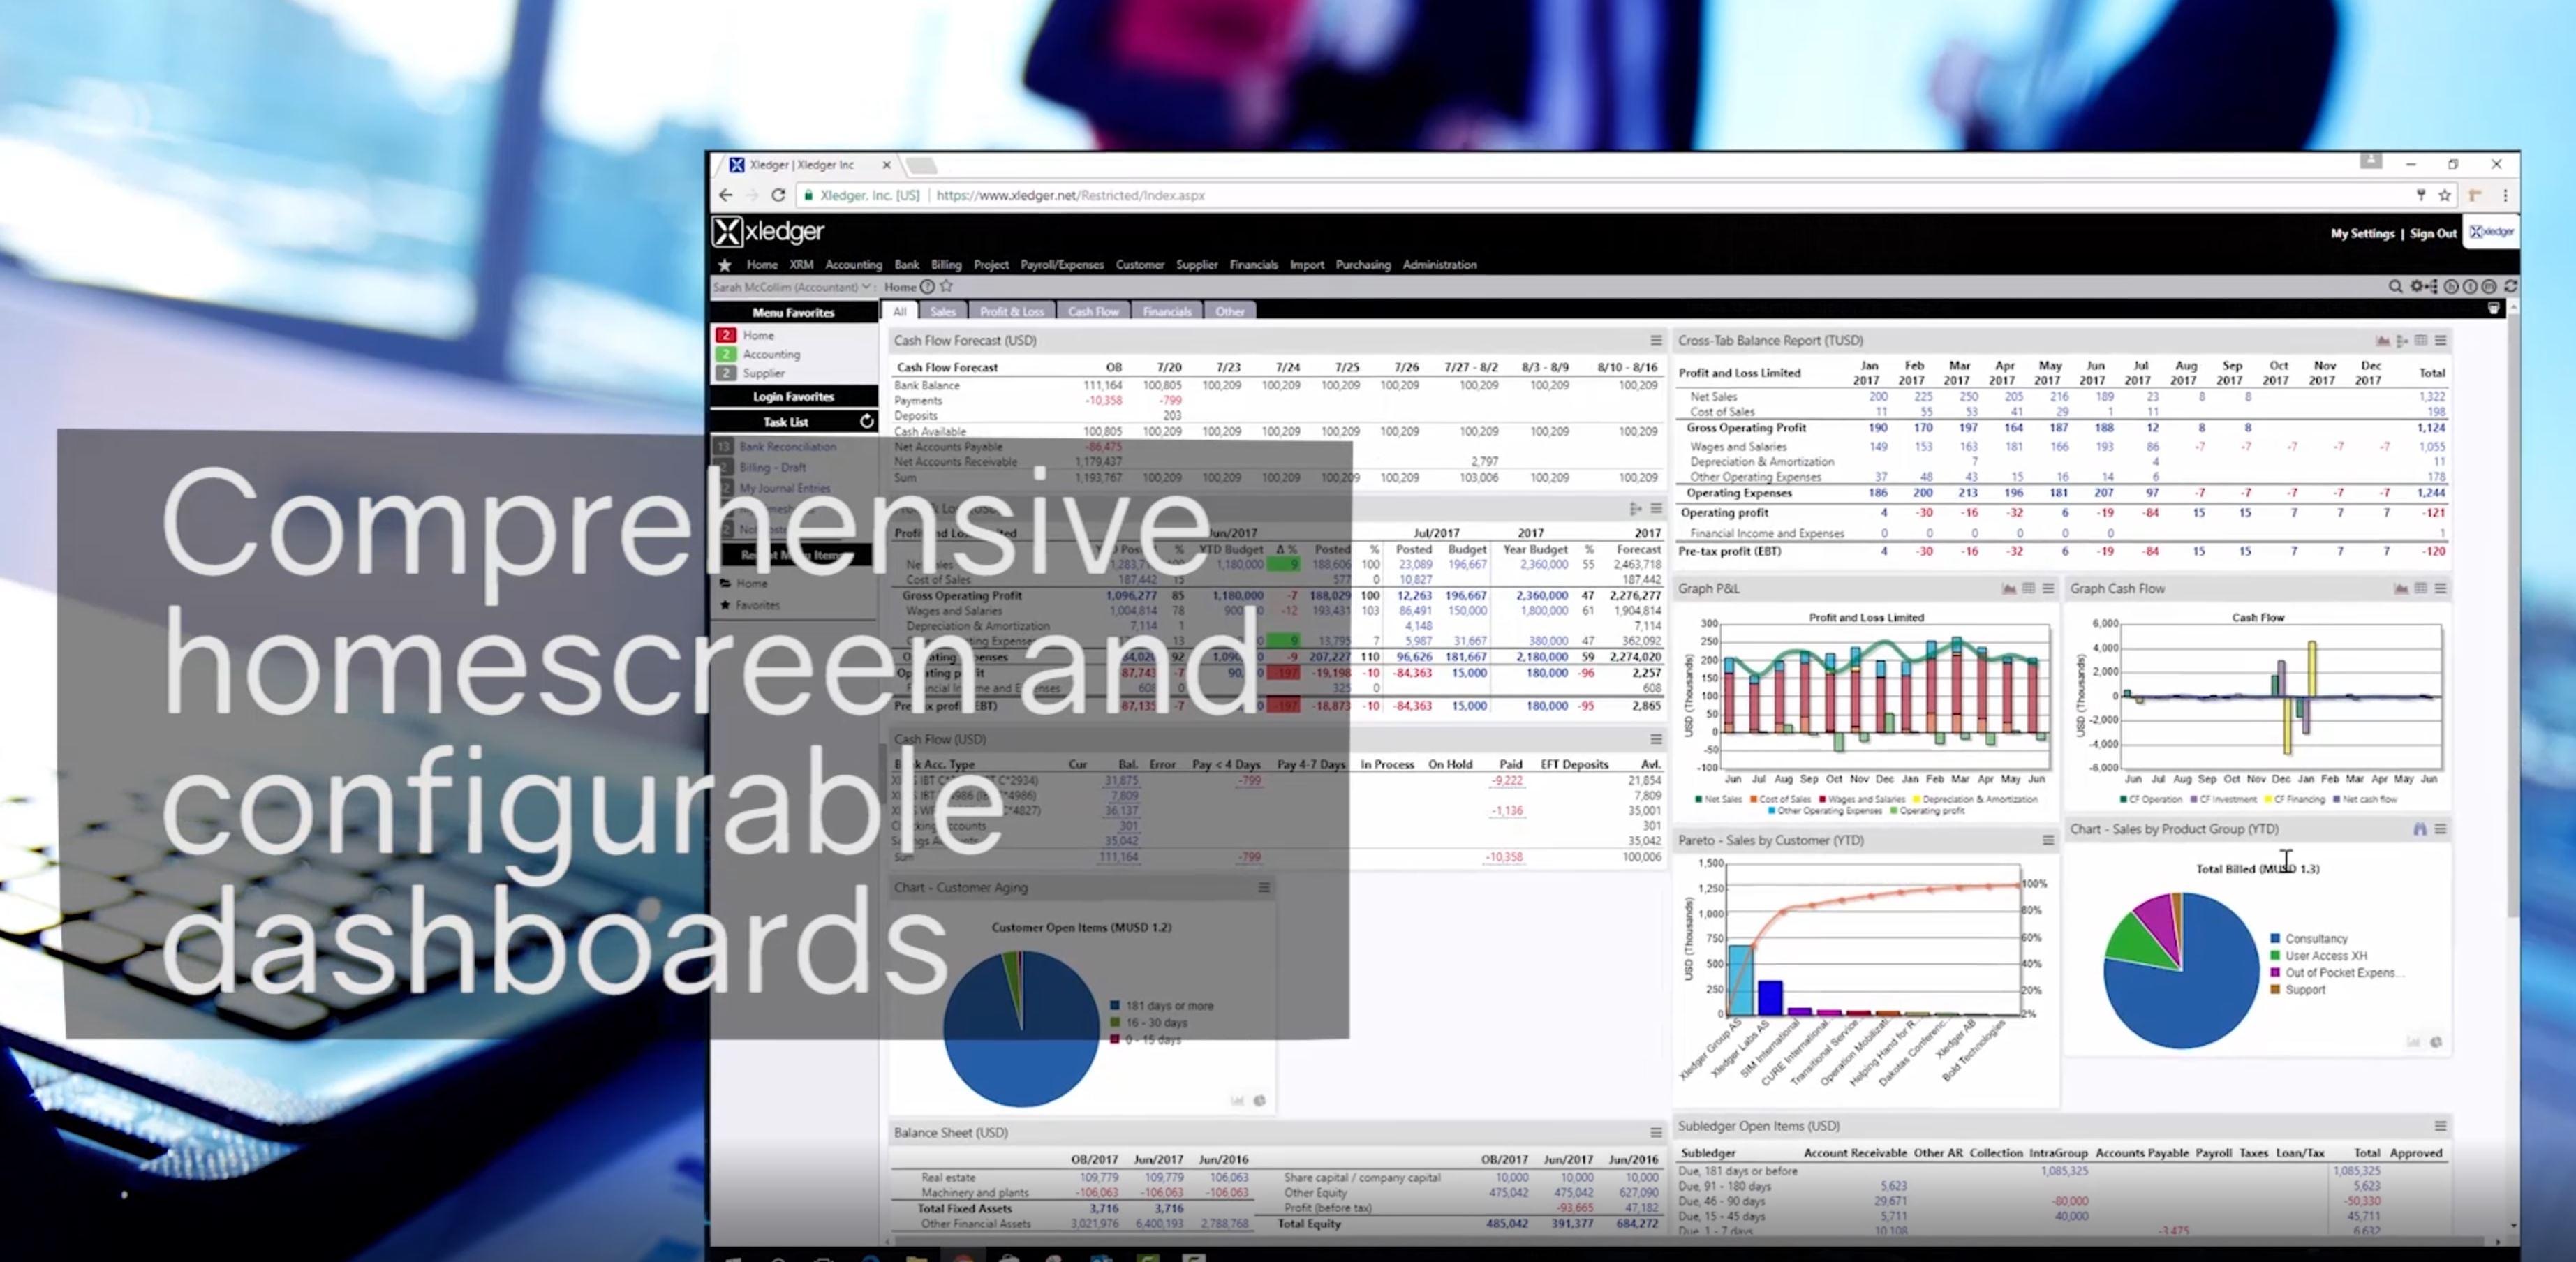 Video thumbnail showing Xledger's homescreen